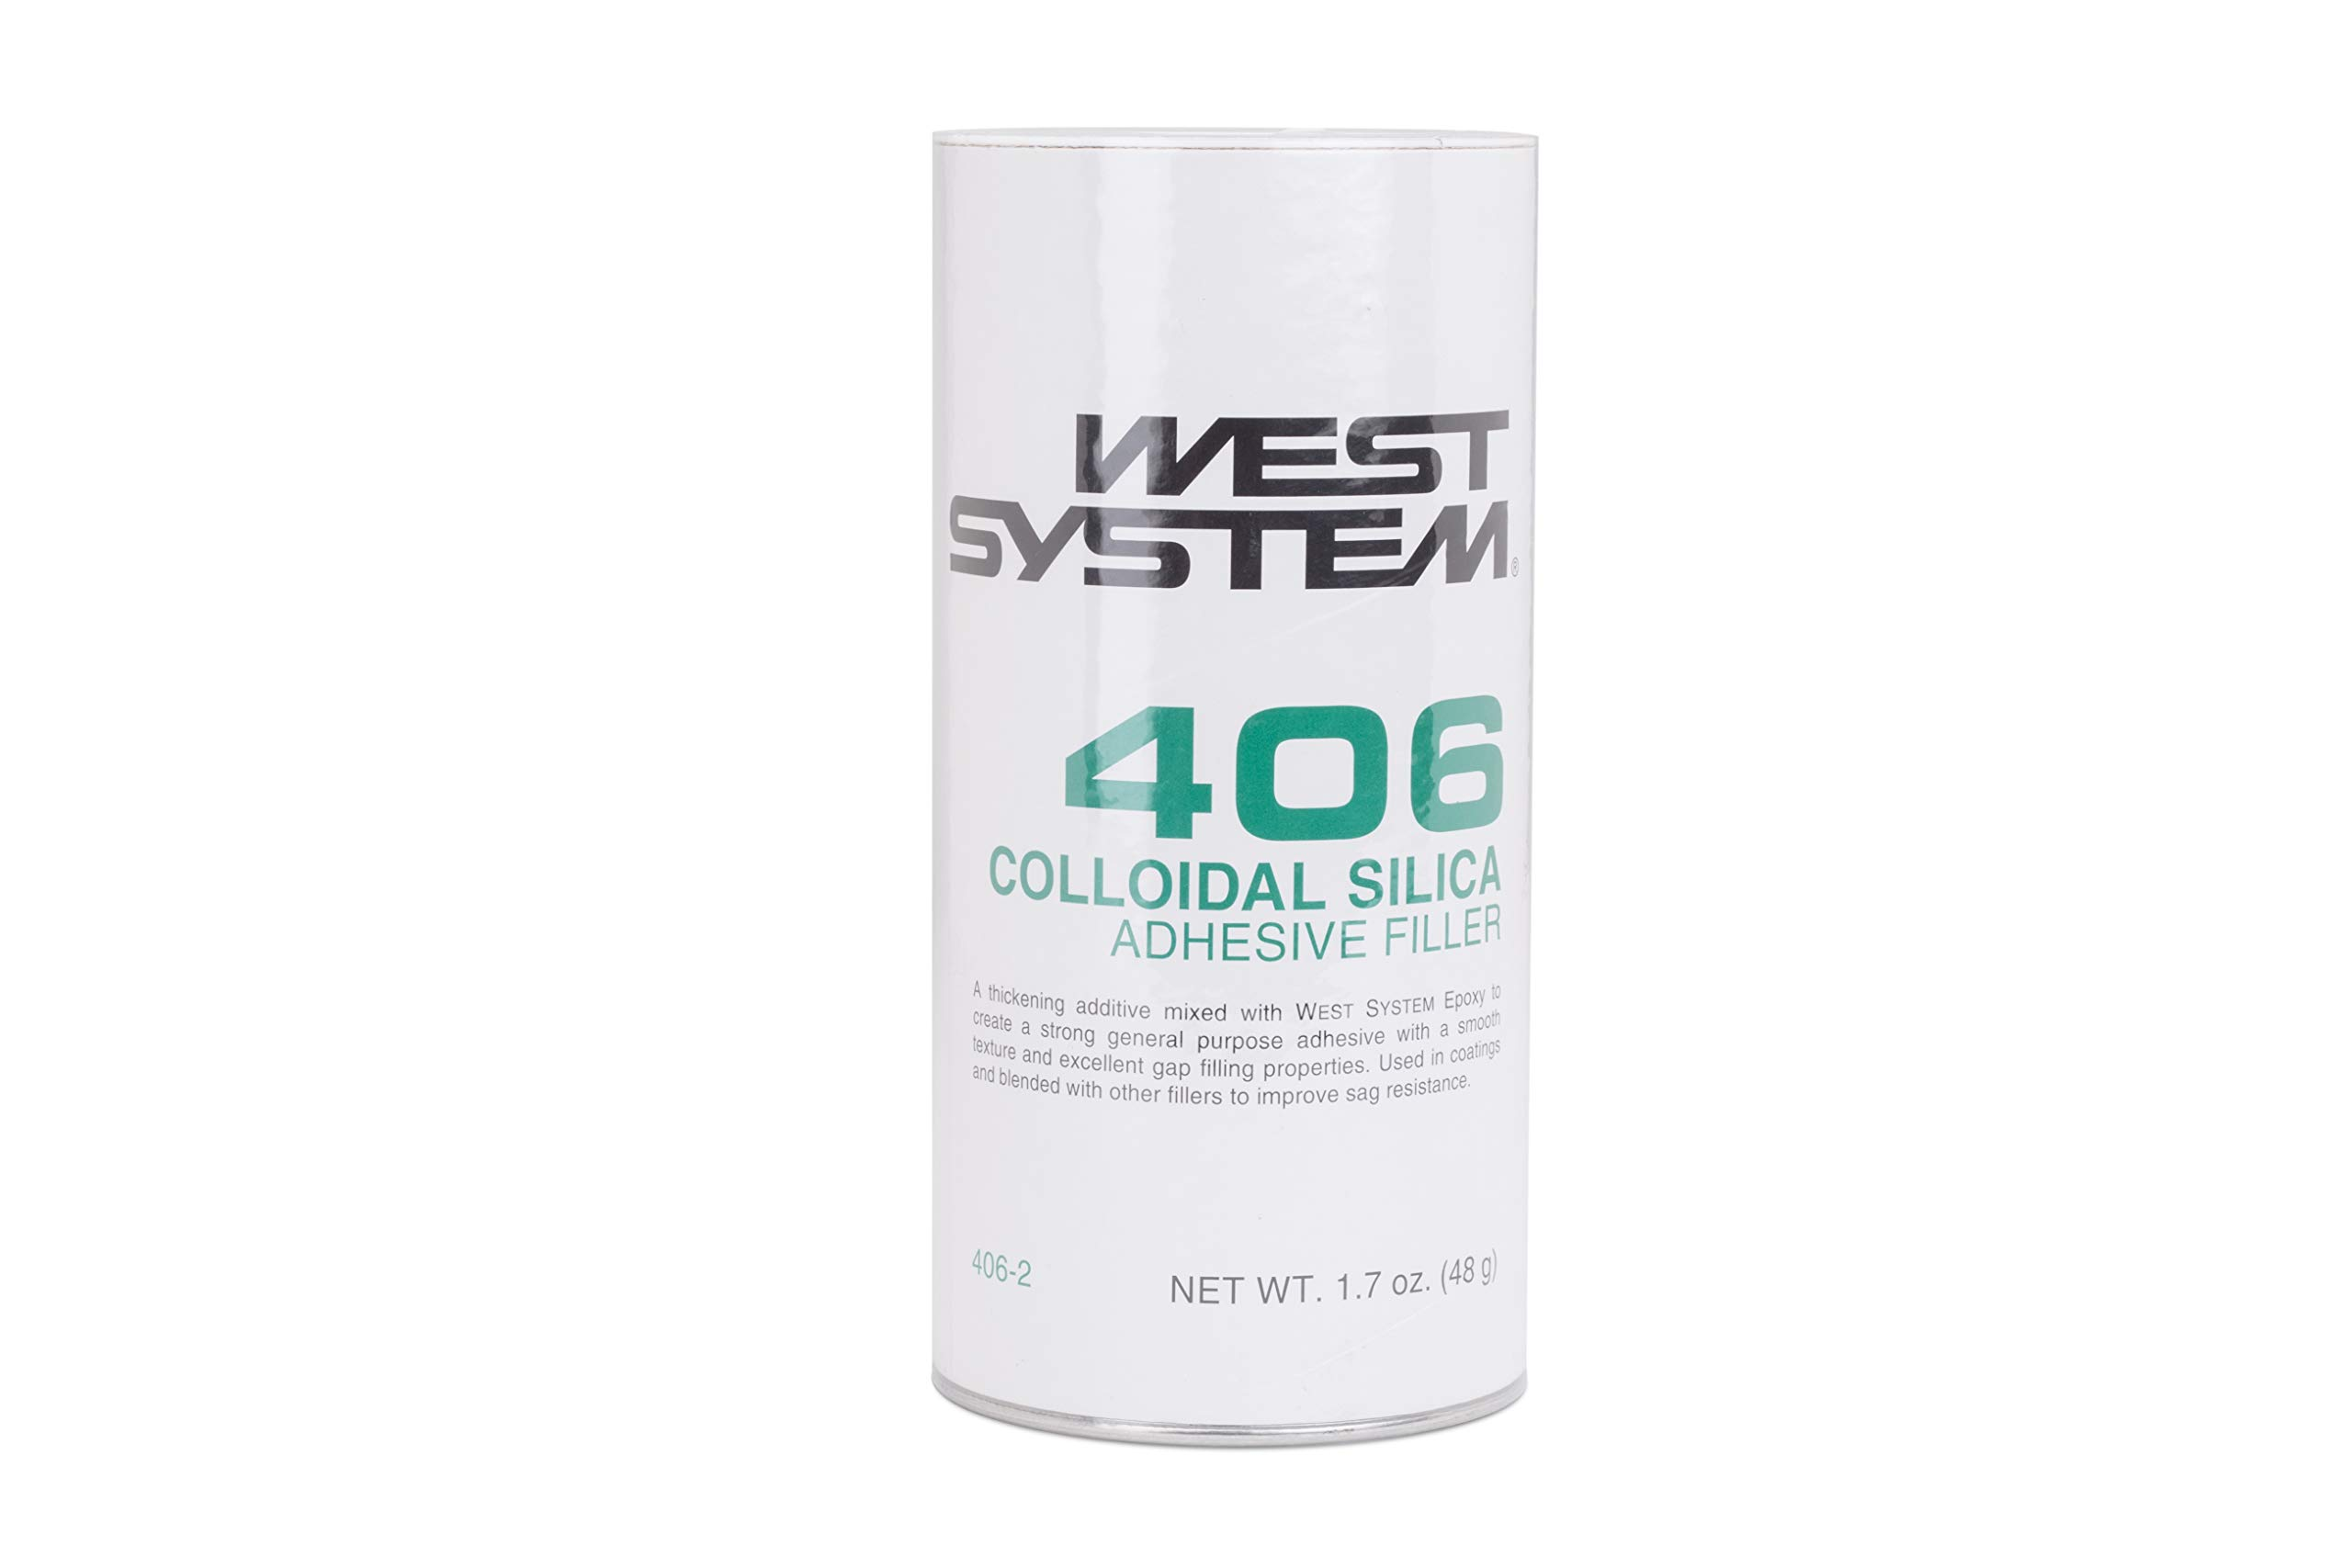 West System 406-2 Colloidal Silica 1.7 oz.